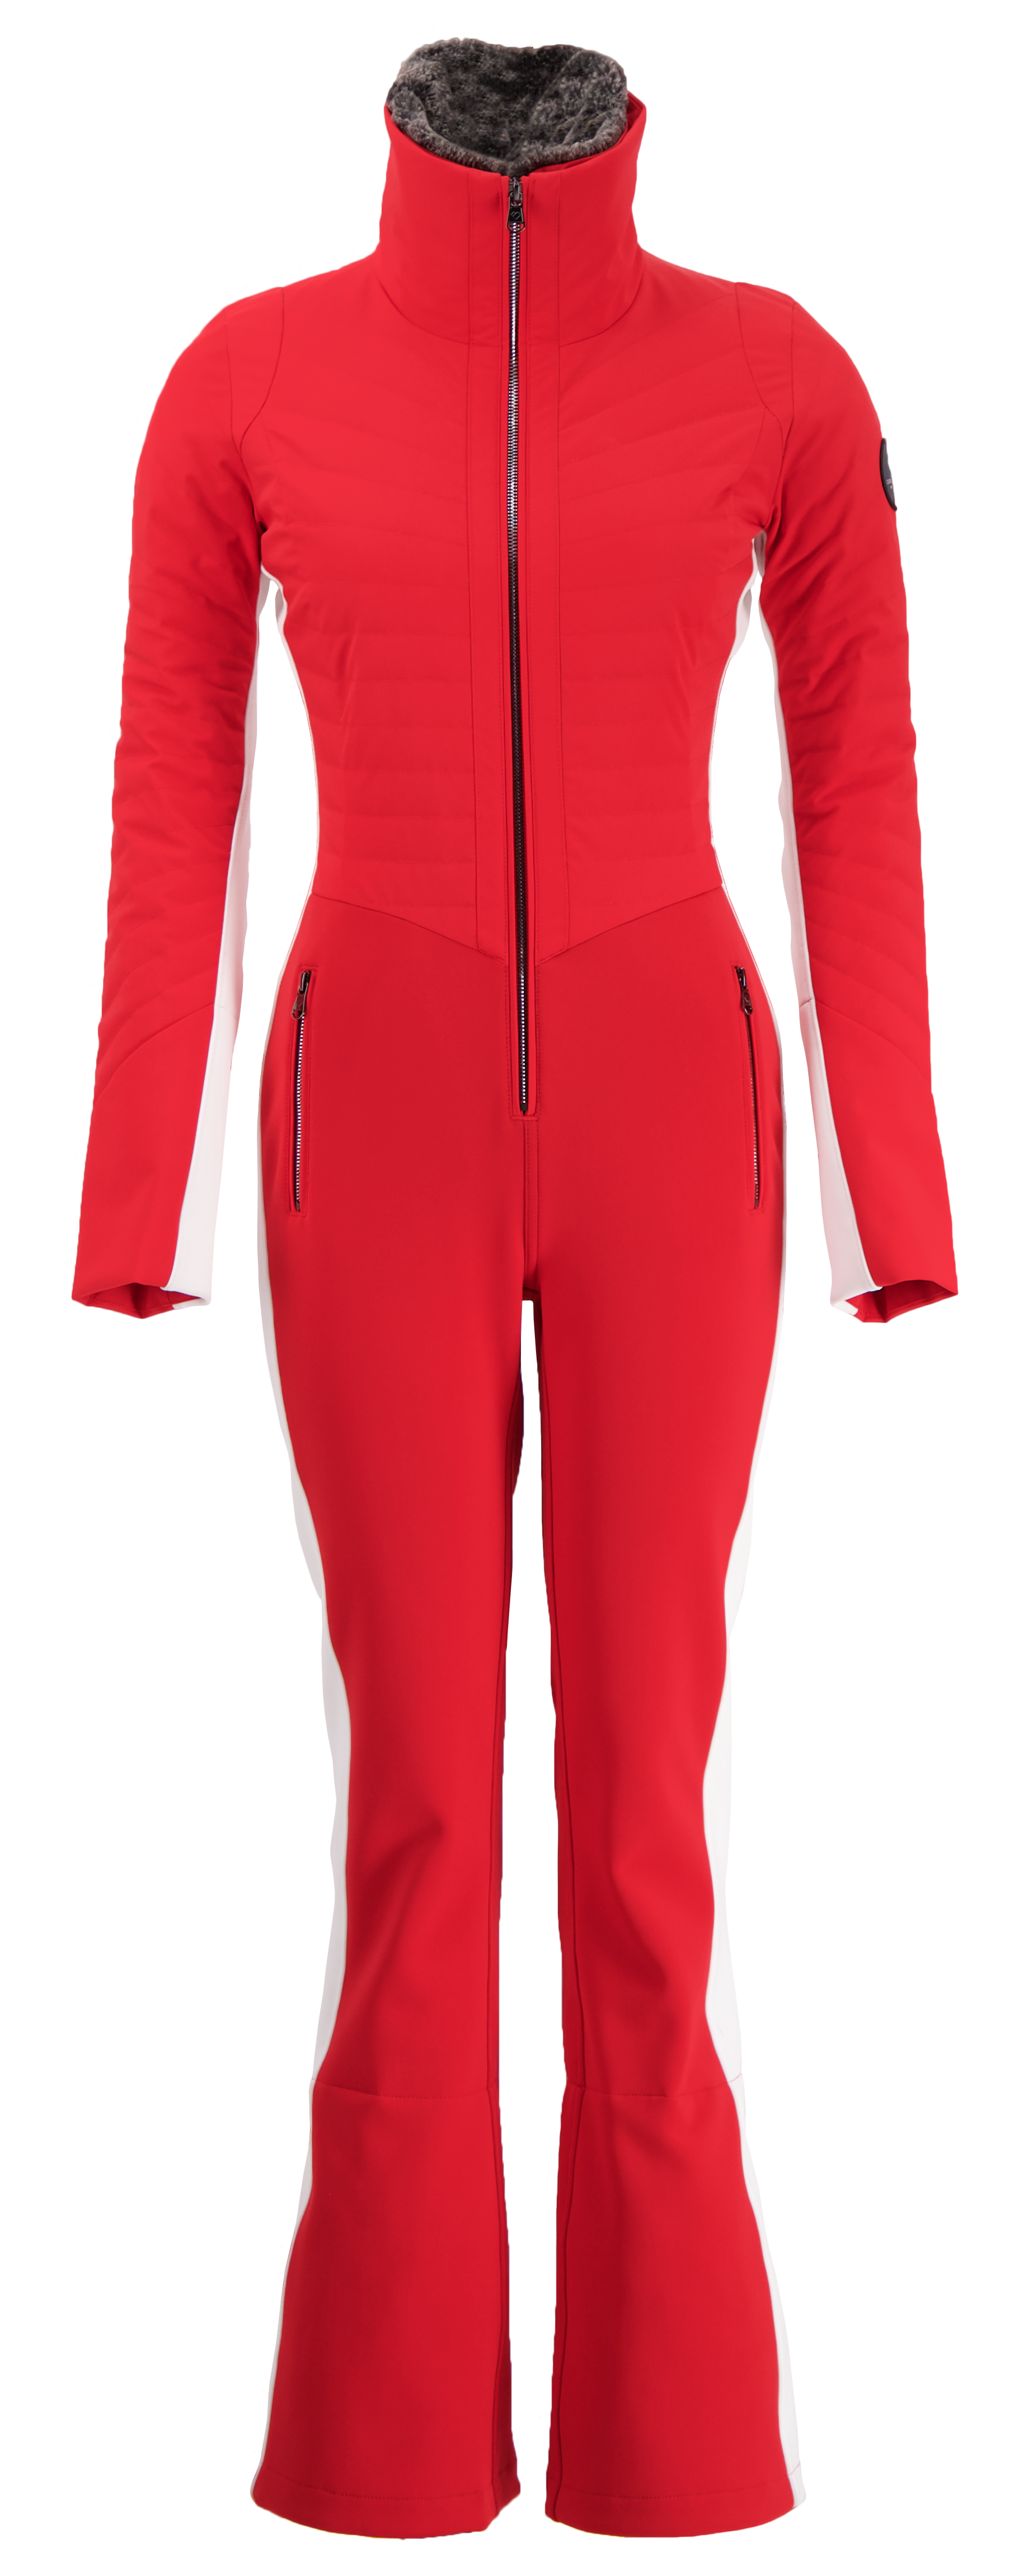 Bode Miller Com Slalom 0205